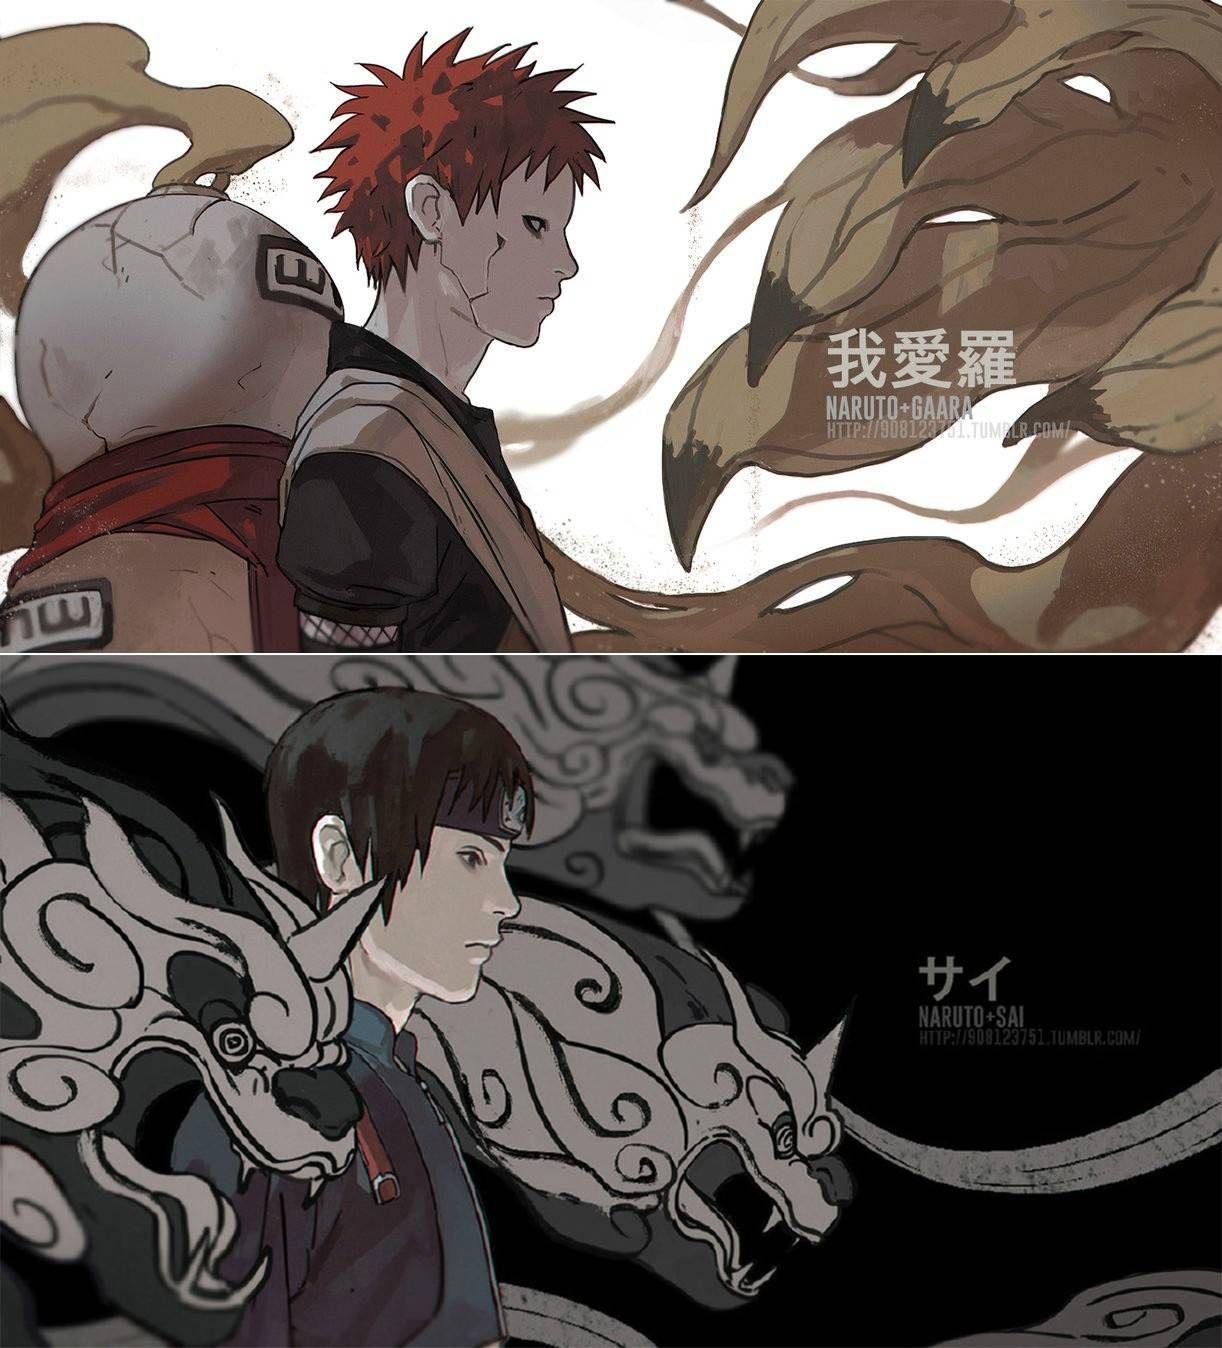 Pin by 韩冬阳 Dongyan on Illustration Anime naruto, Anime